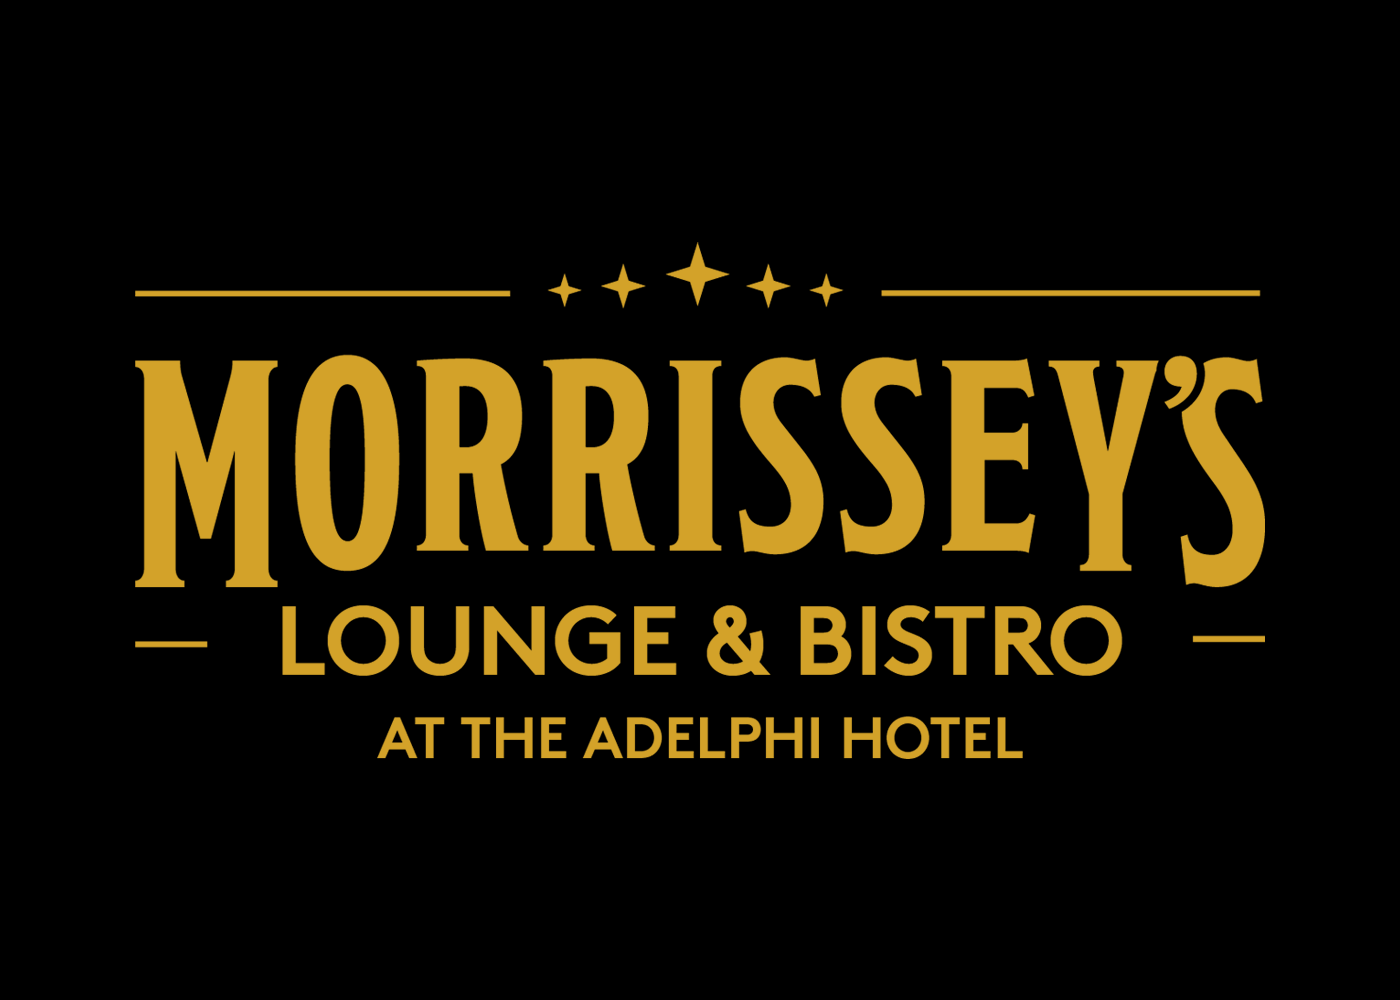 Morrissey's Lounge & Bistro